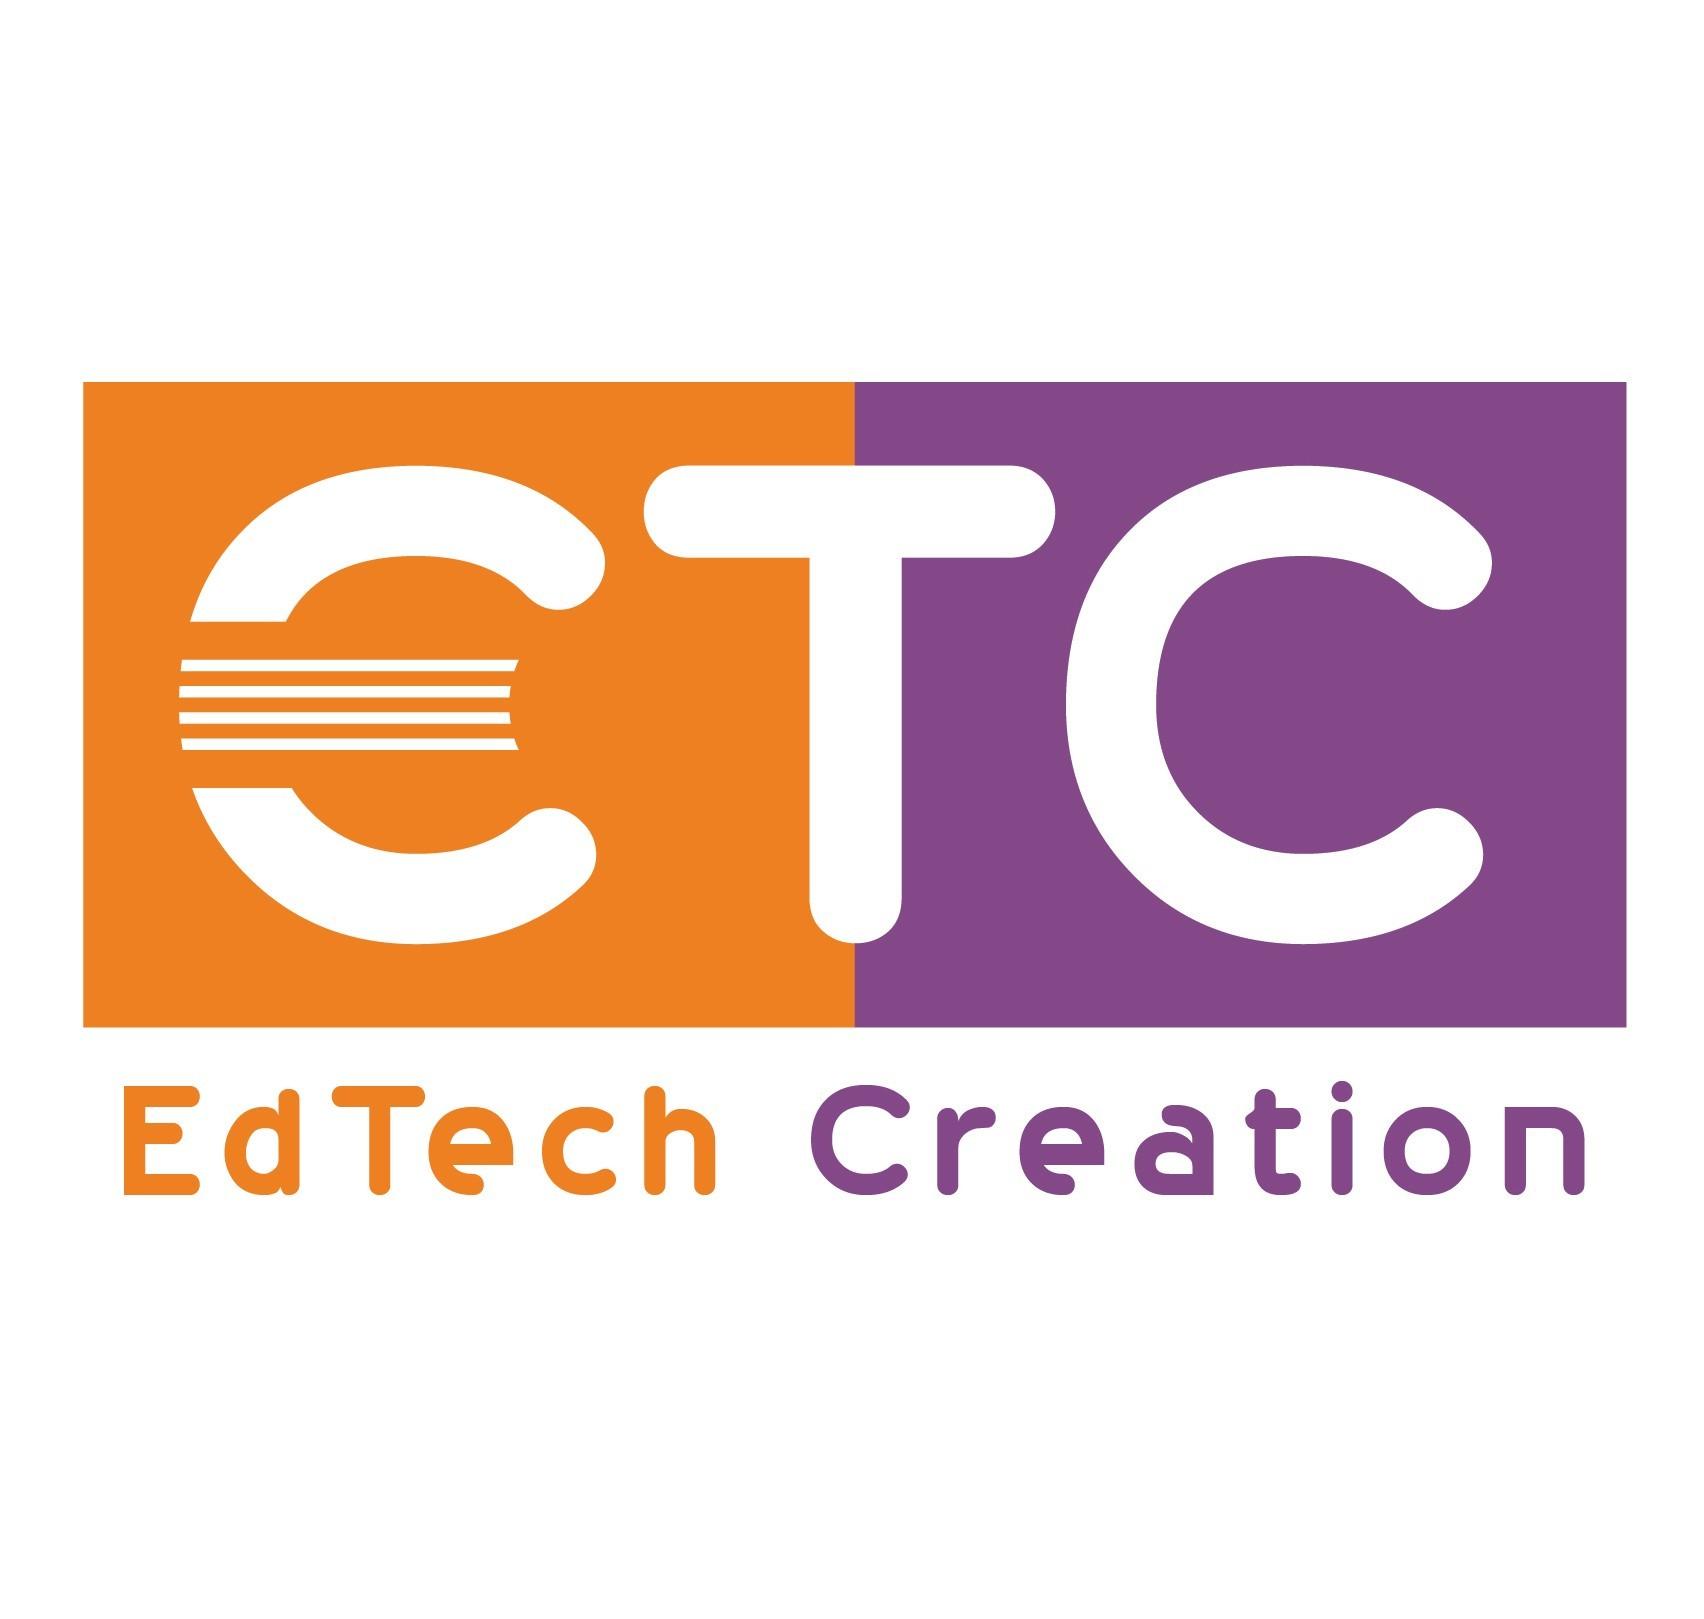 EdTech Creation